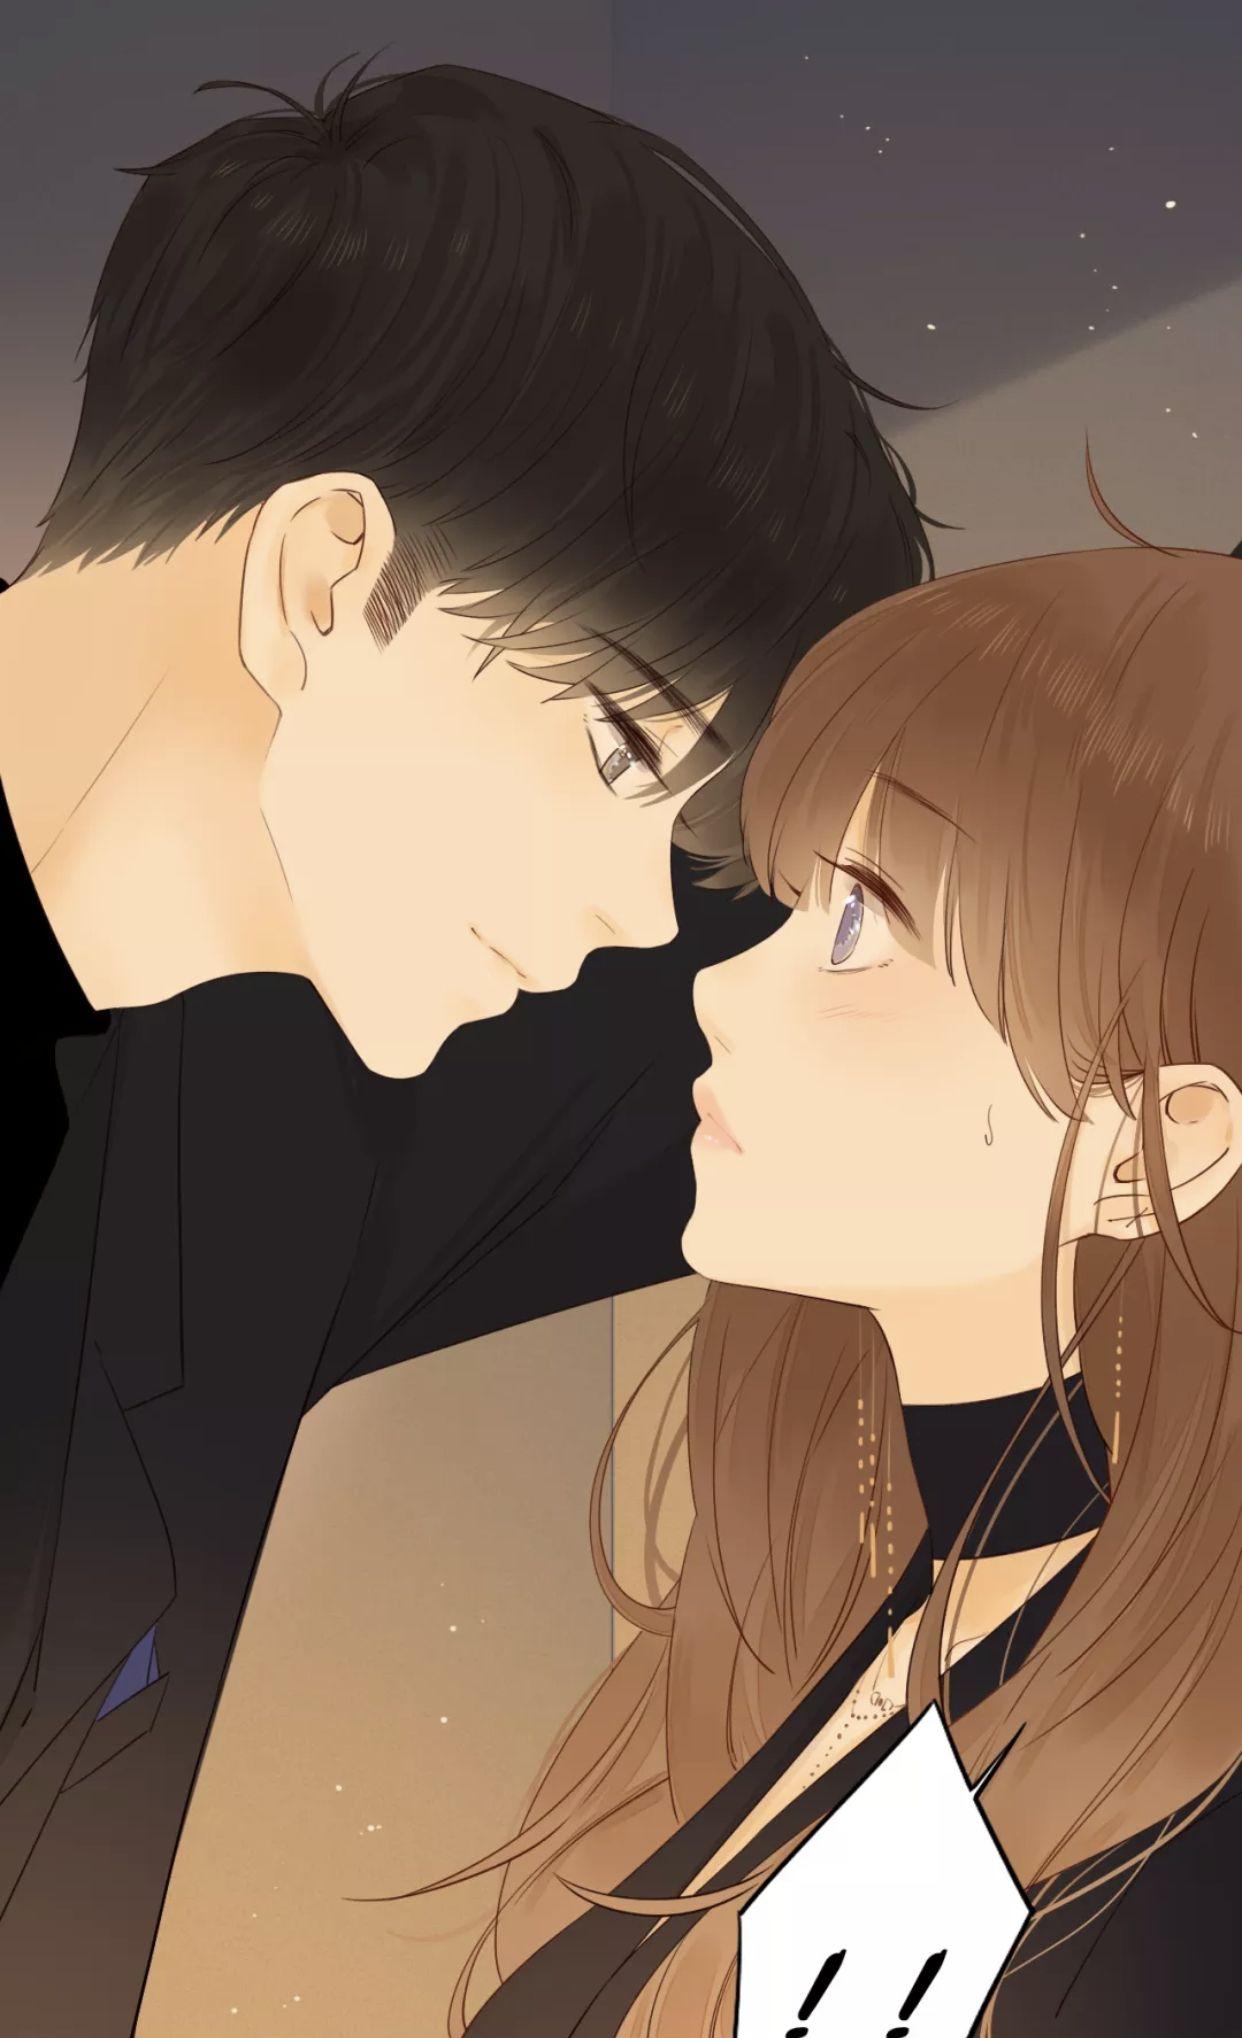 She May Not Be Cute Chap 35 Risunki Anime Art Anime